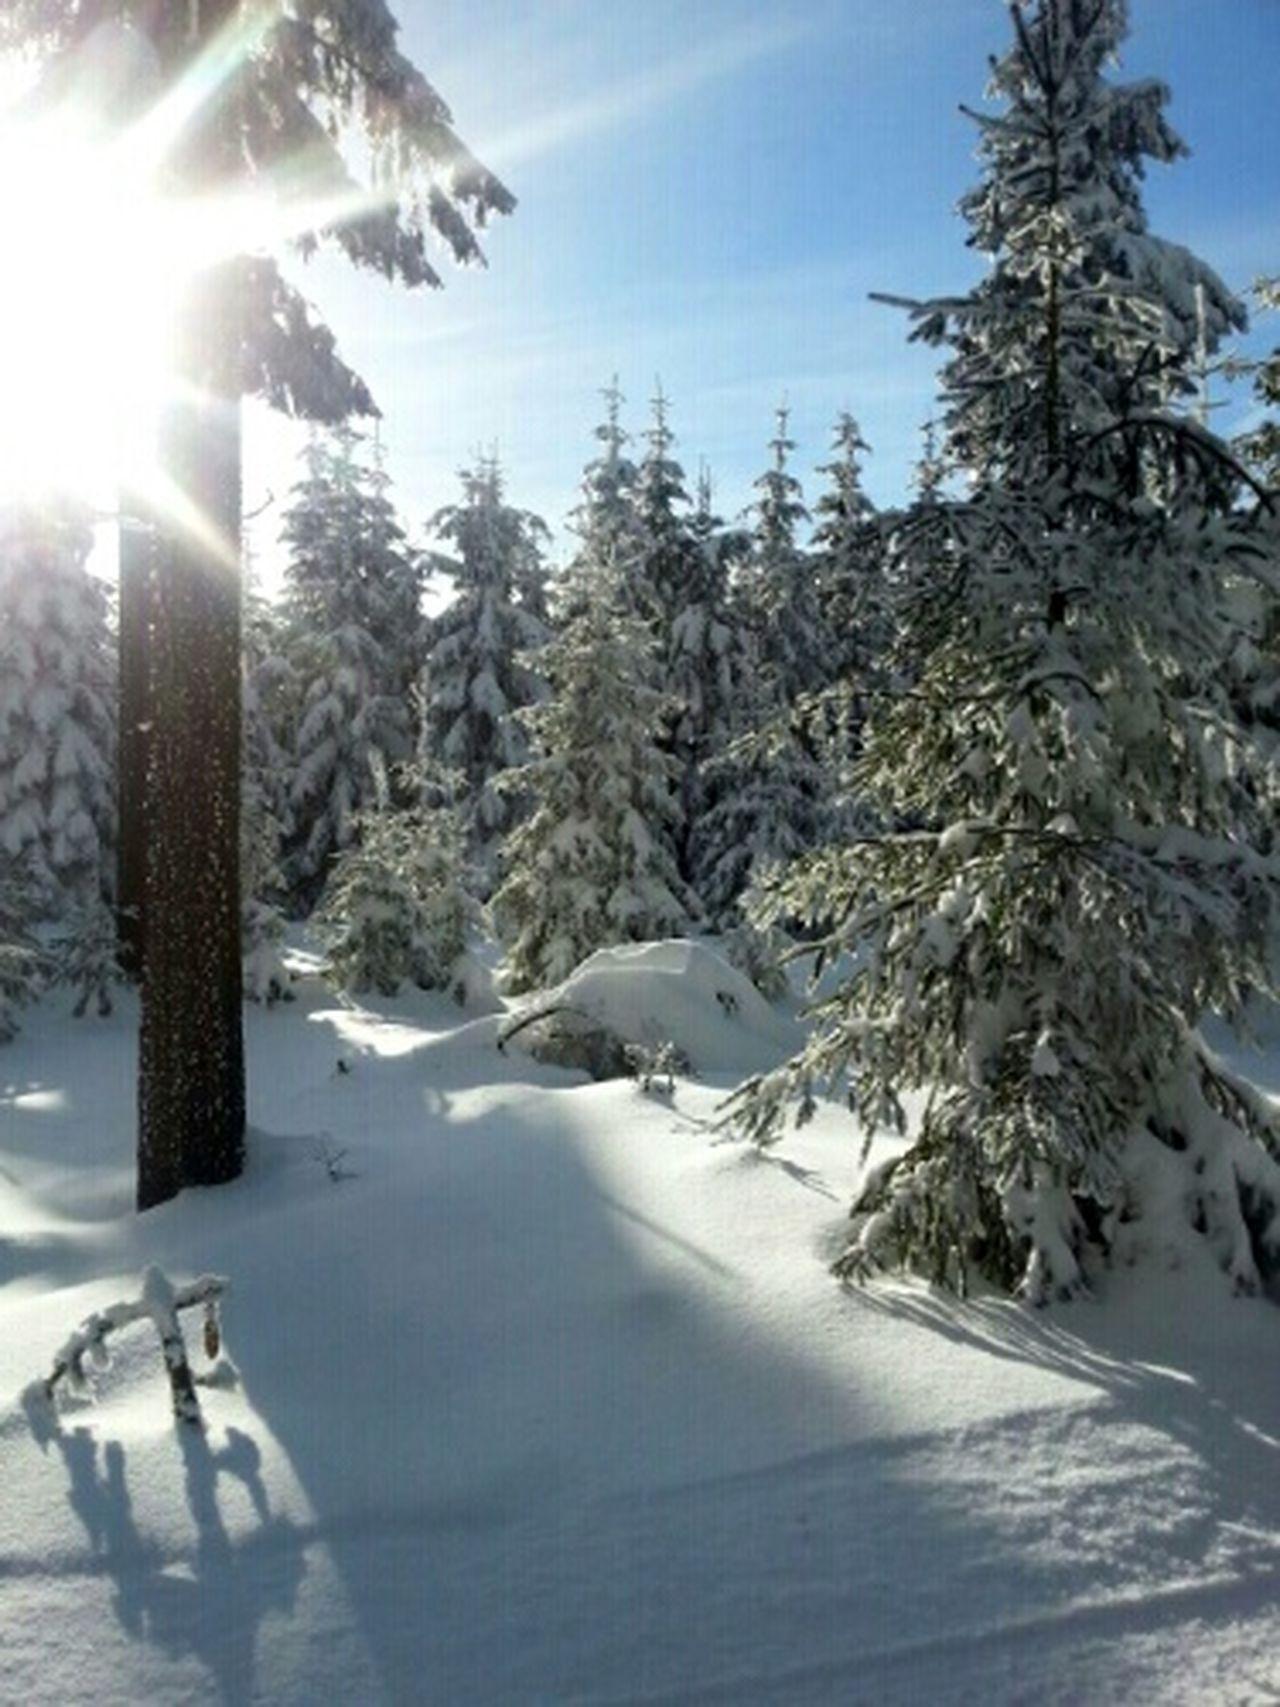 The Purist (no Edit, No Filter) TheMinimals (less Edit Juxt Photography) Landscape_Collection Snow Trees Sunshine! Winter Trees Winter Landscape Cold Winter ❄⛄